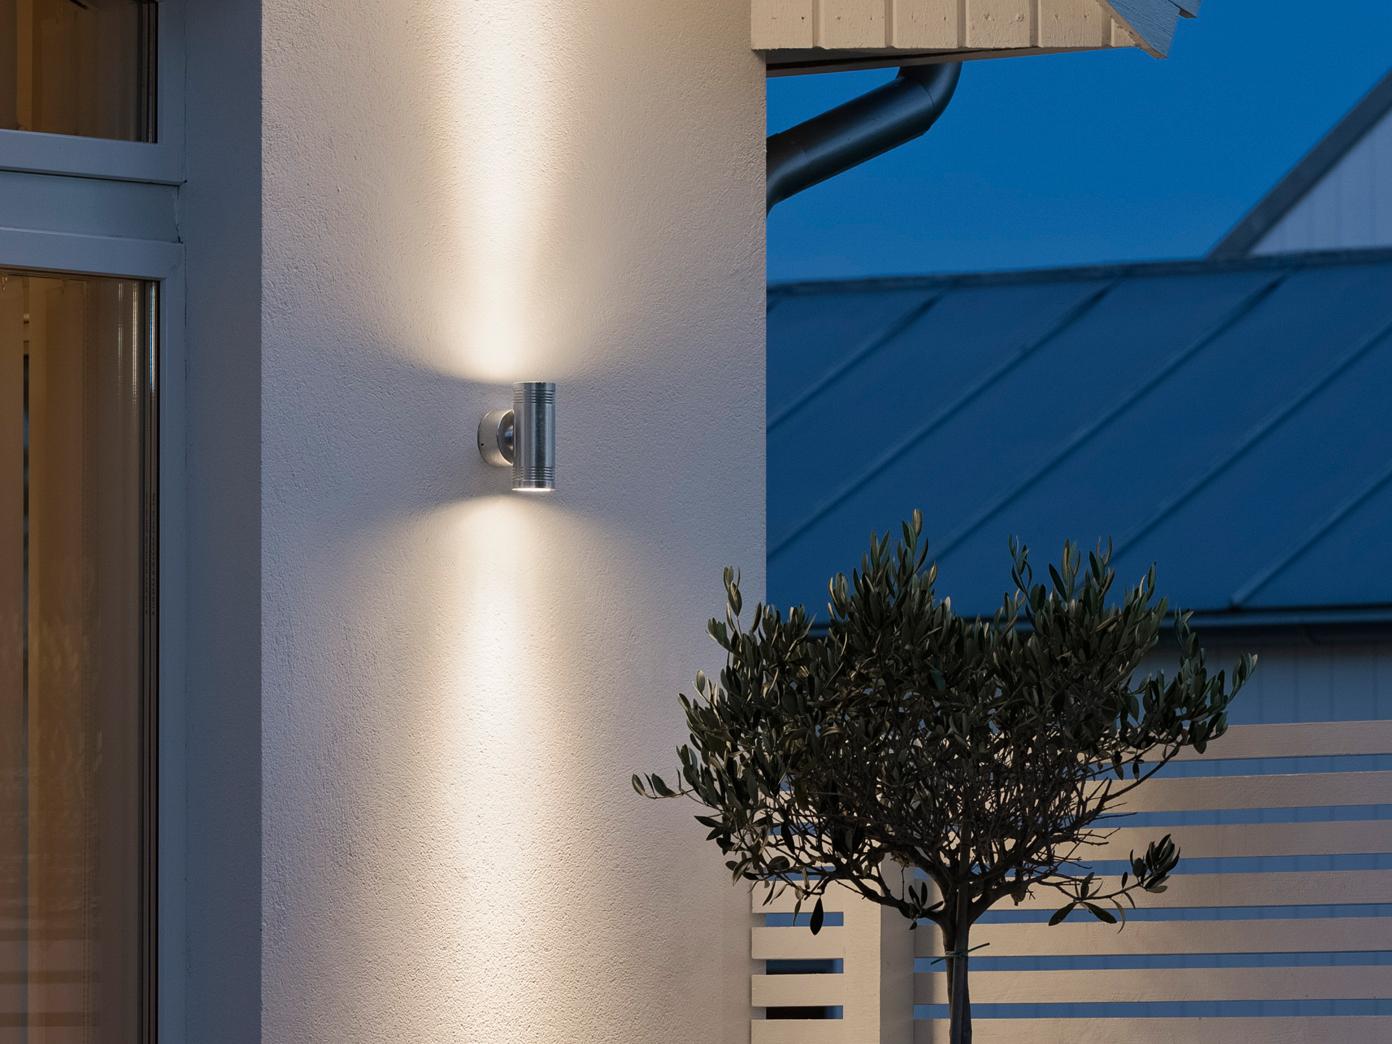 Außenwandleuchte Außenwandleuchte Außenwandleuchte MONZA, Up Down-light, massives Alu, H  15 cm, IP54 25ed5a